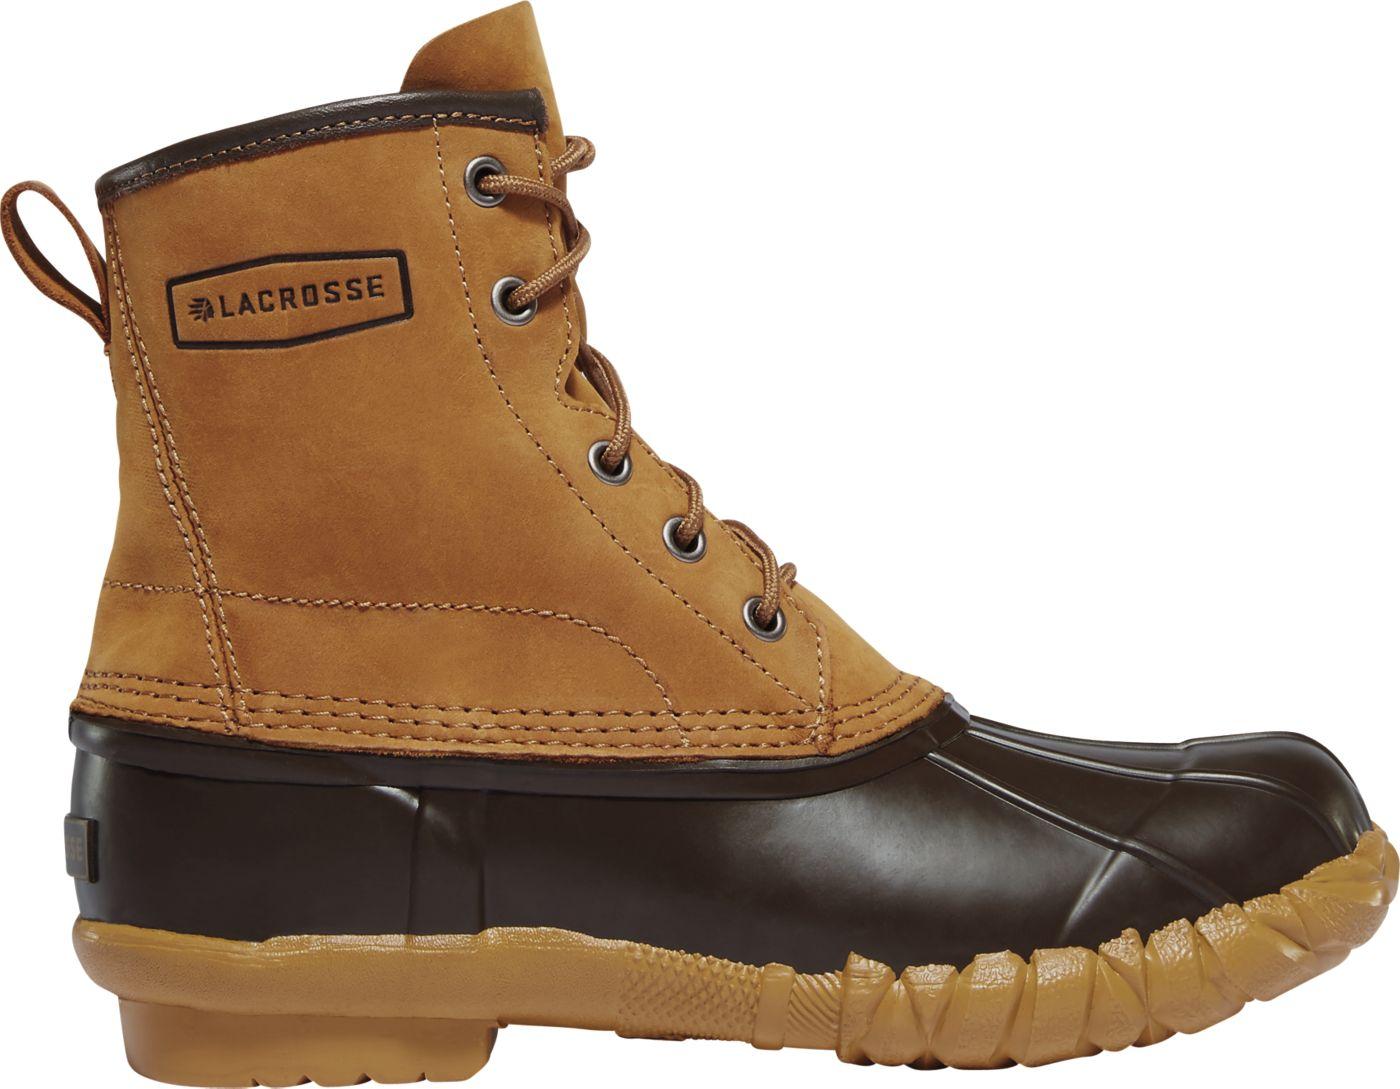 LaCrosse Women's Uplander II 6'' Hunting Boots